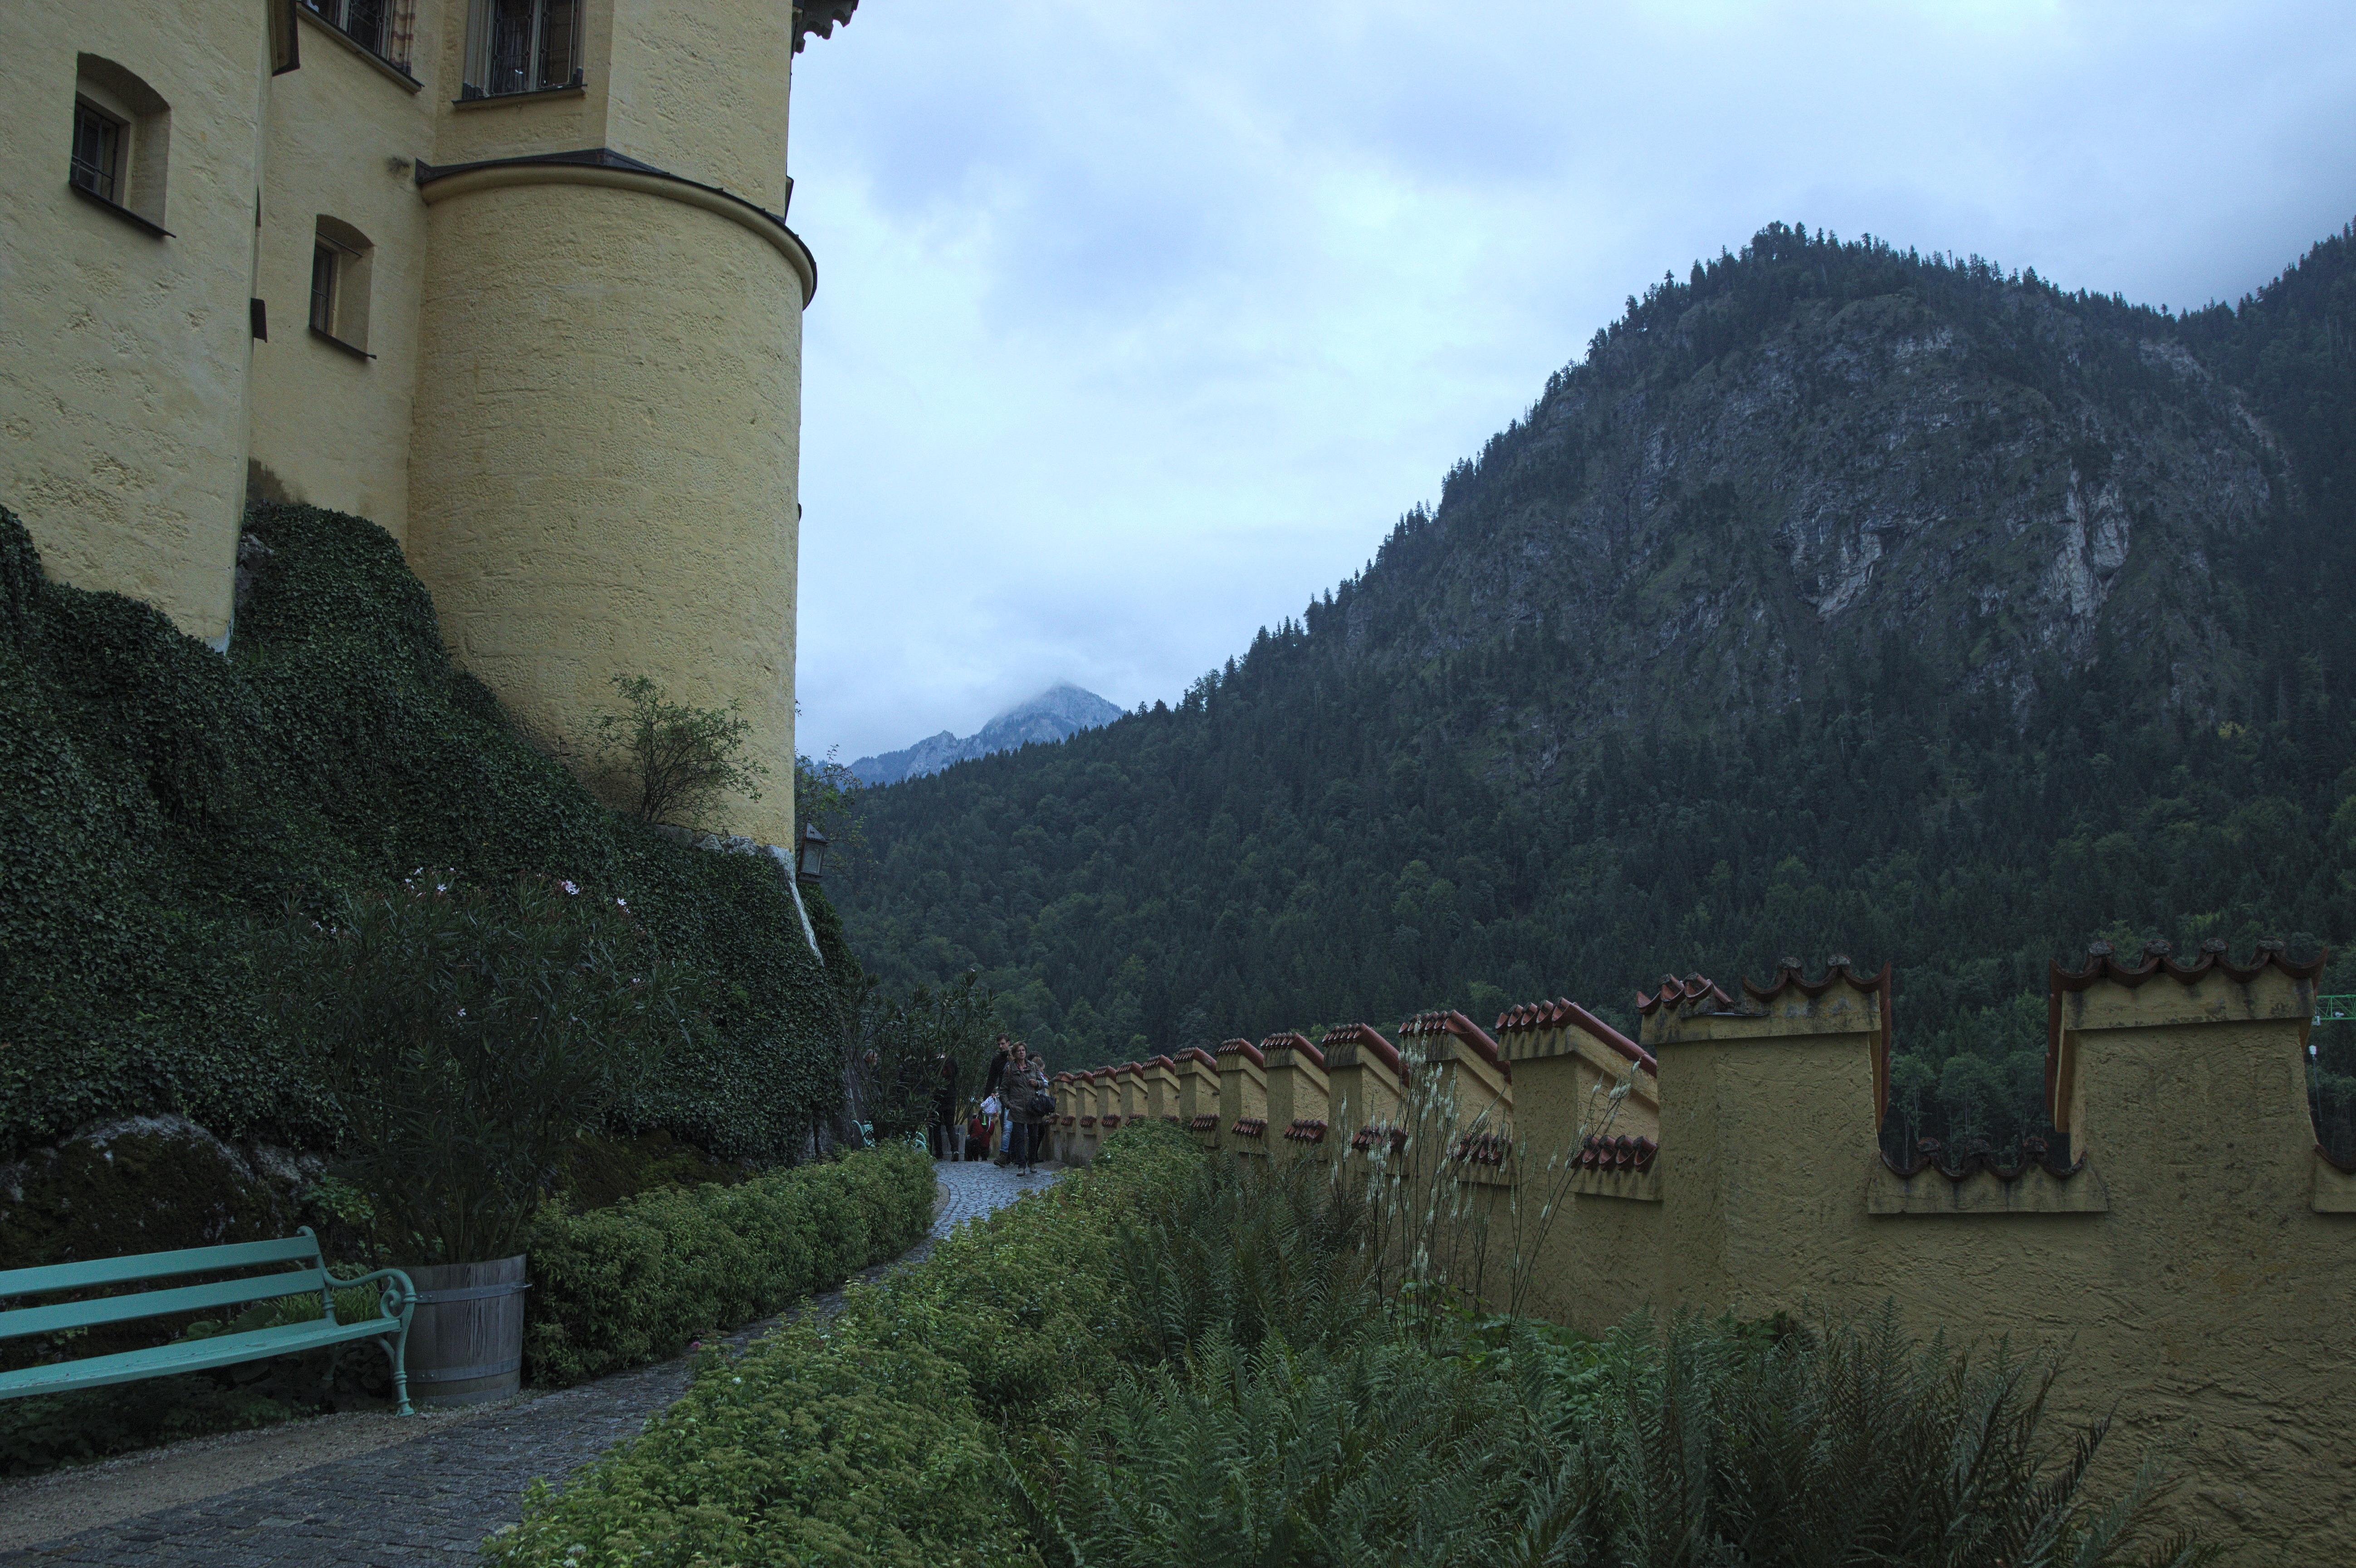 Garden at Schloss Hohenschwangau, Architecture, Building, Car, Mountain, HQ Photo